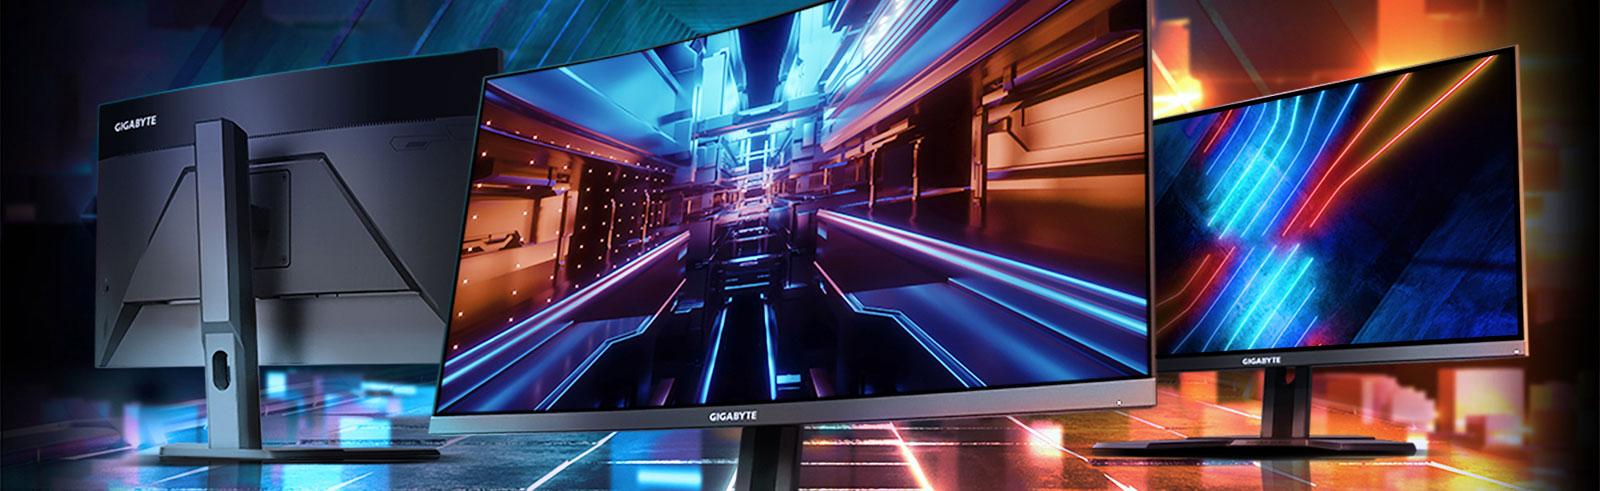 Gigabyte G27F, G27QC and G32QC gaming monitors announced